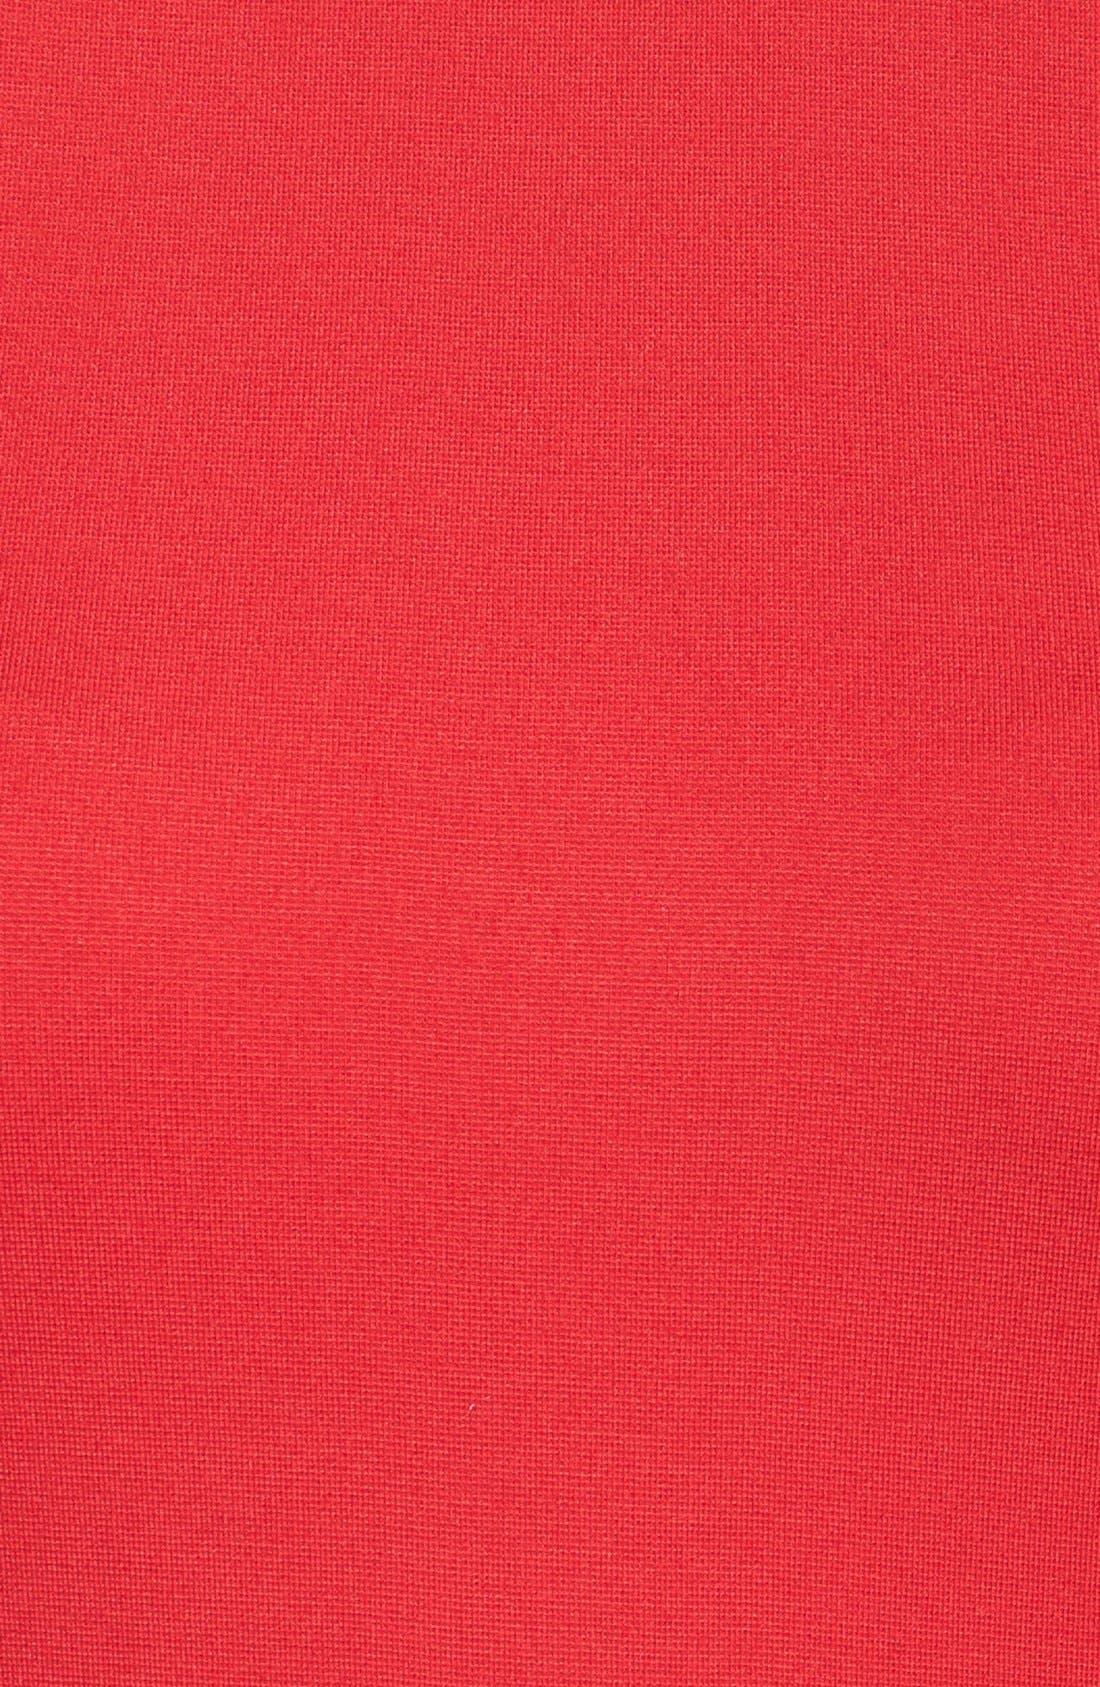 Alternate Image 5  - Felicity & Coco Capriana Ruffle Sheath Dress (Regular & Petite) (Nordstrom Exclusive)